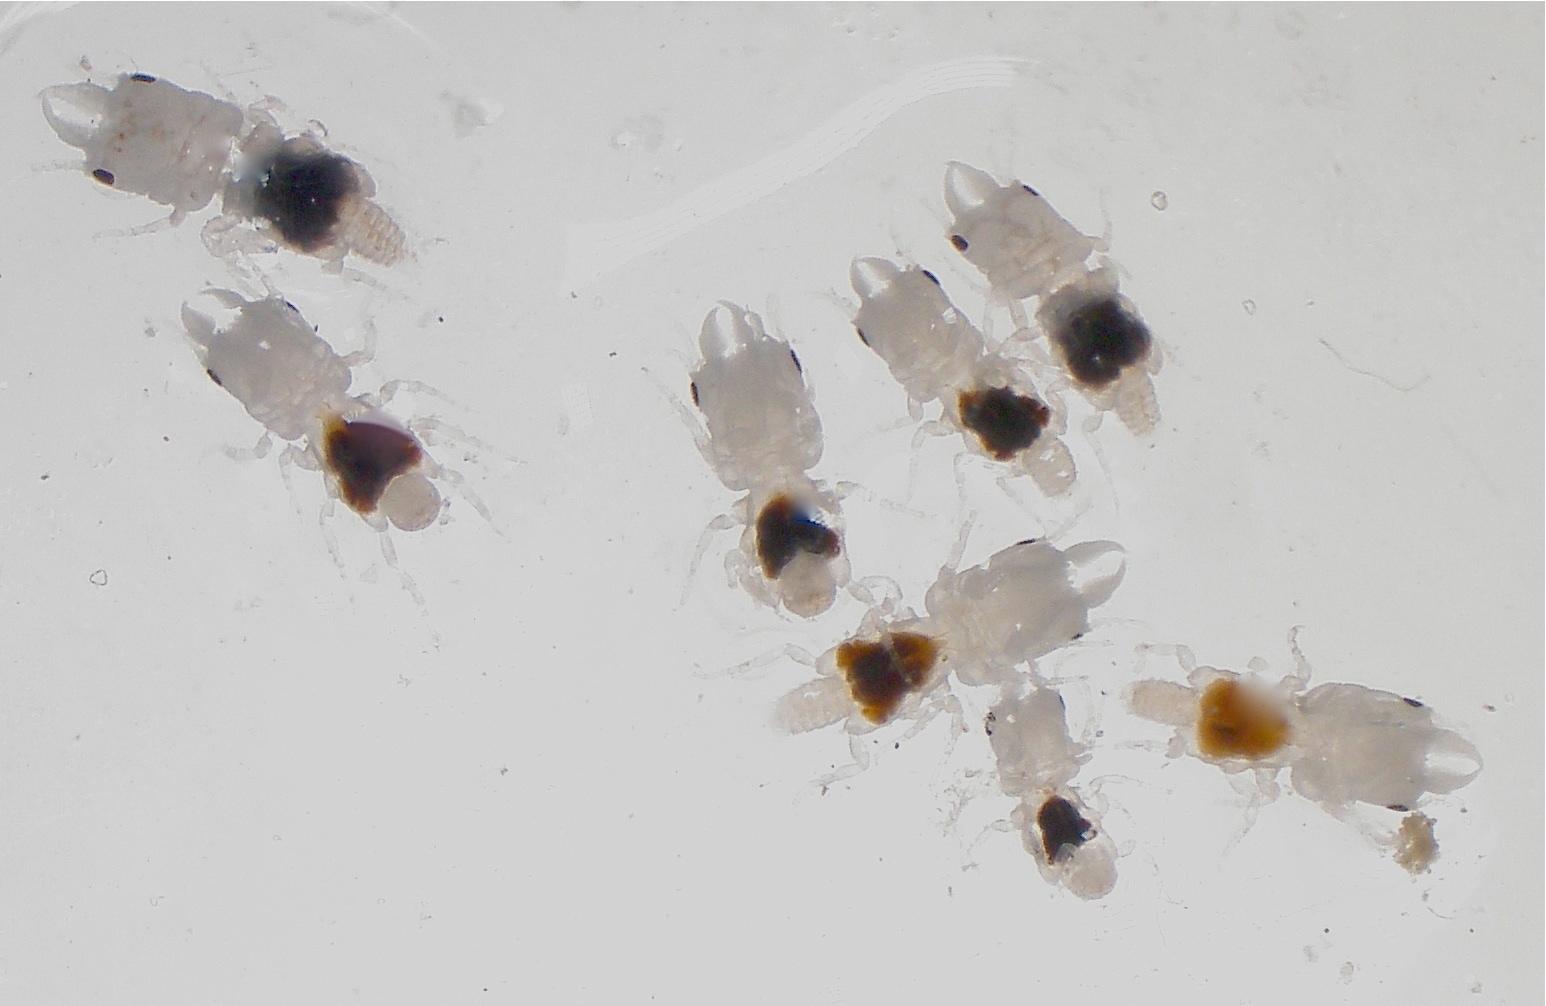 Image of Marley's gnathiid (a crustacean)